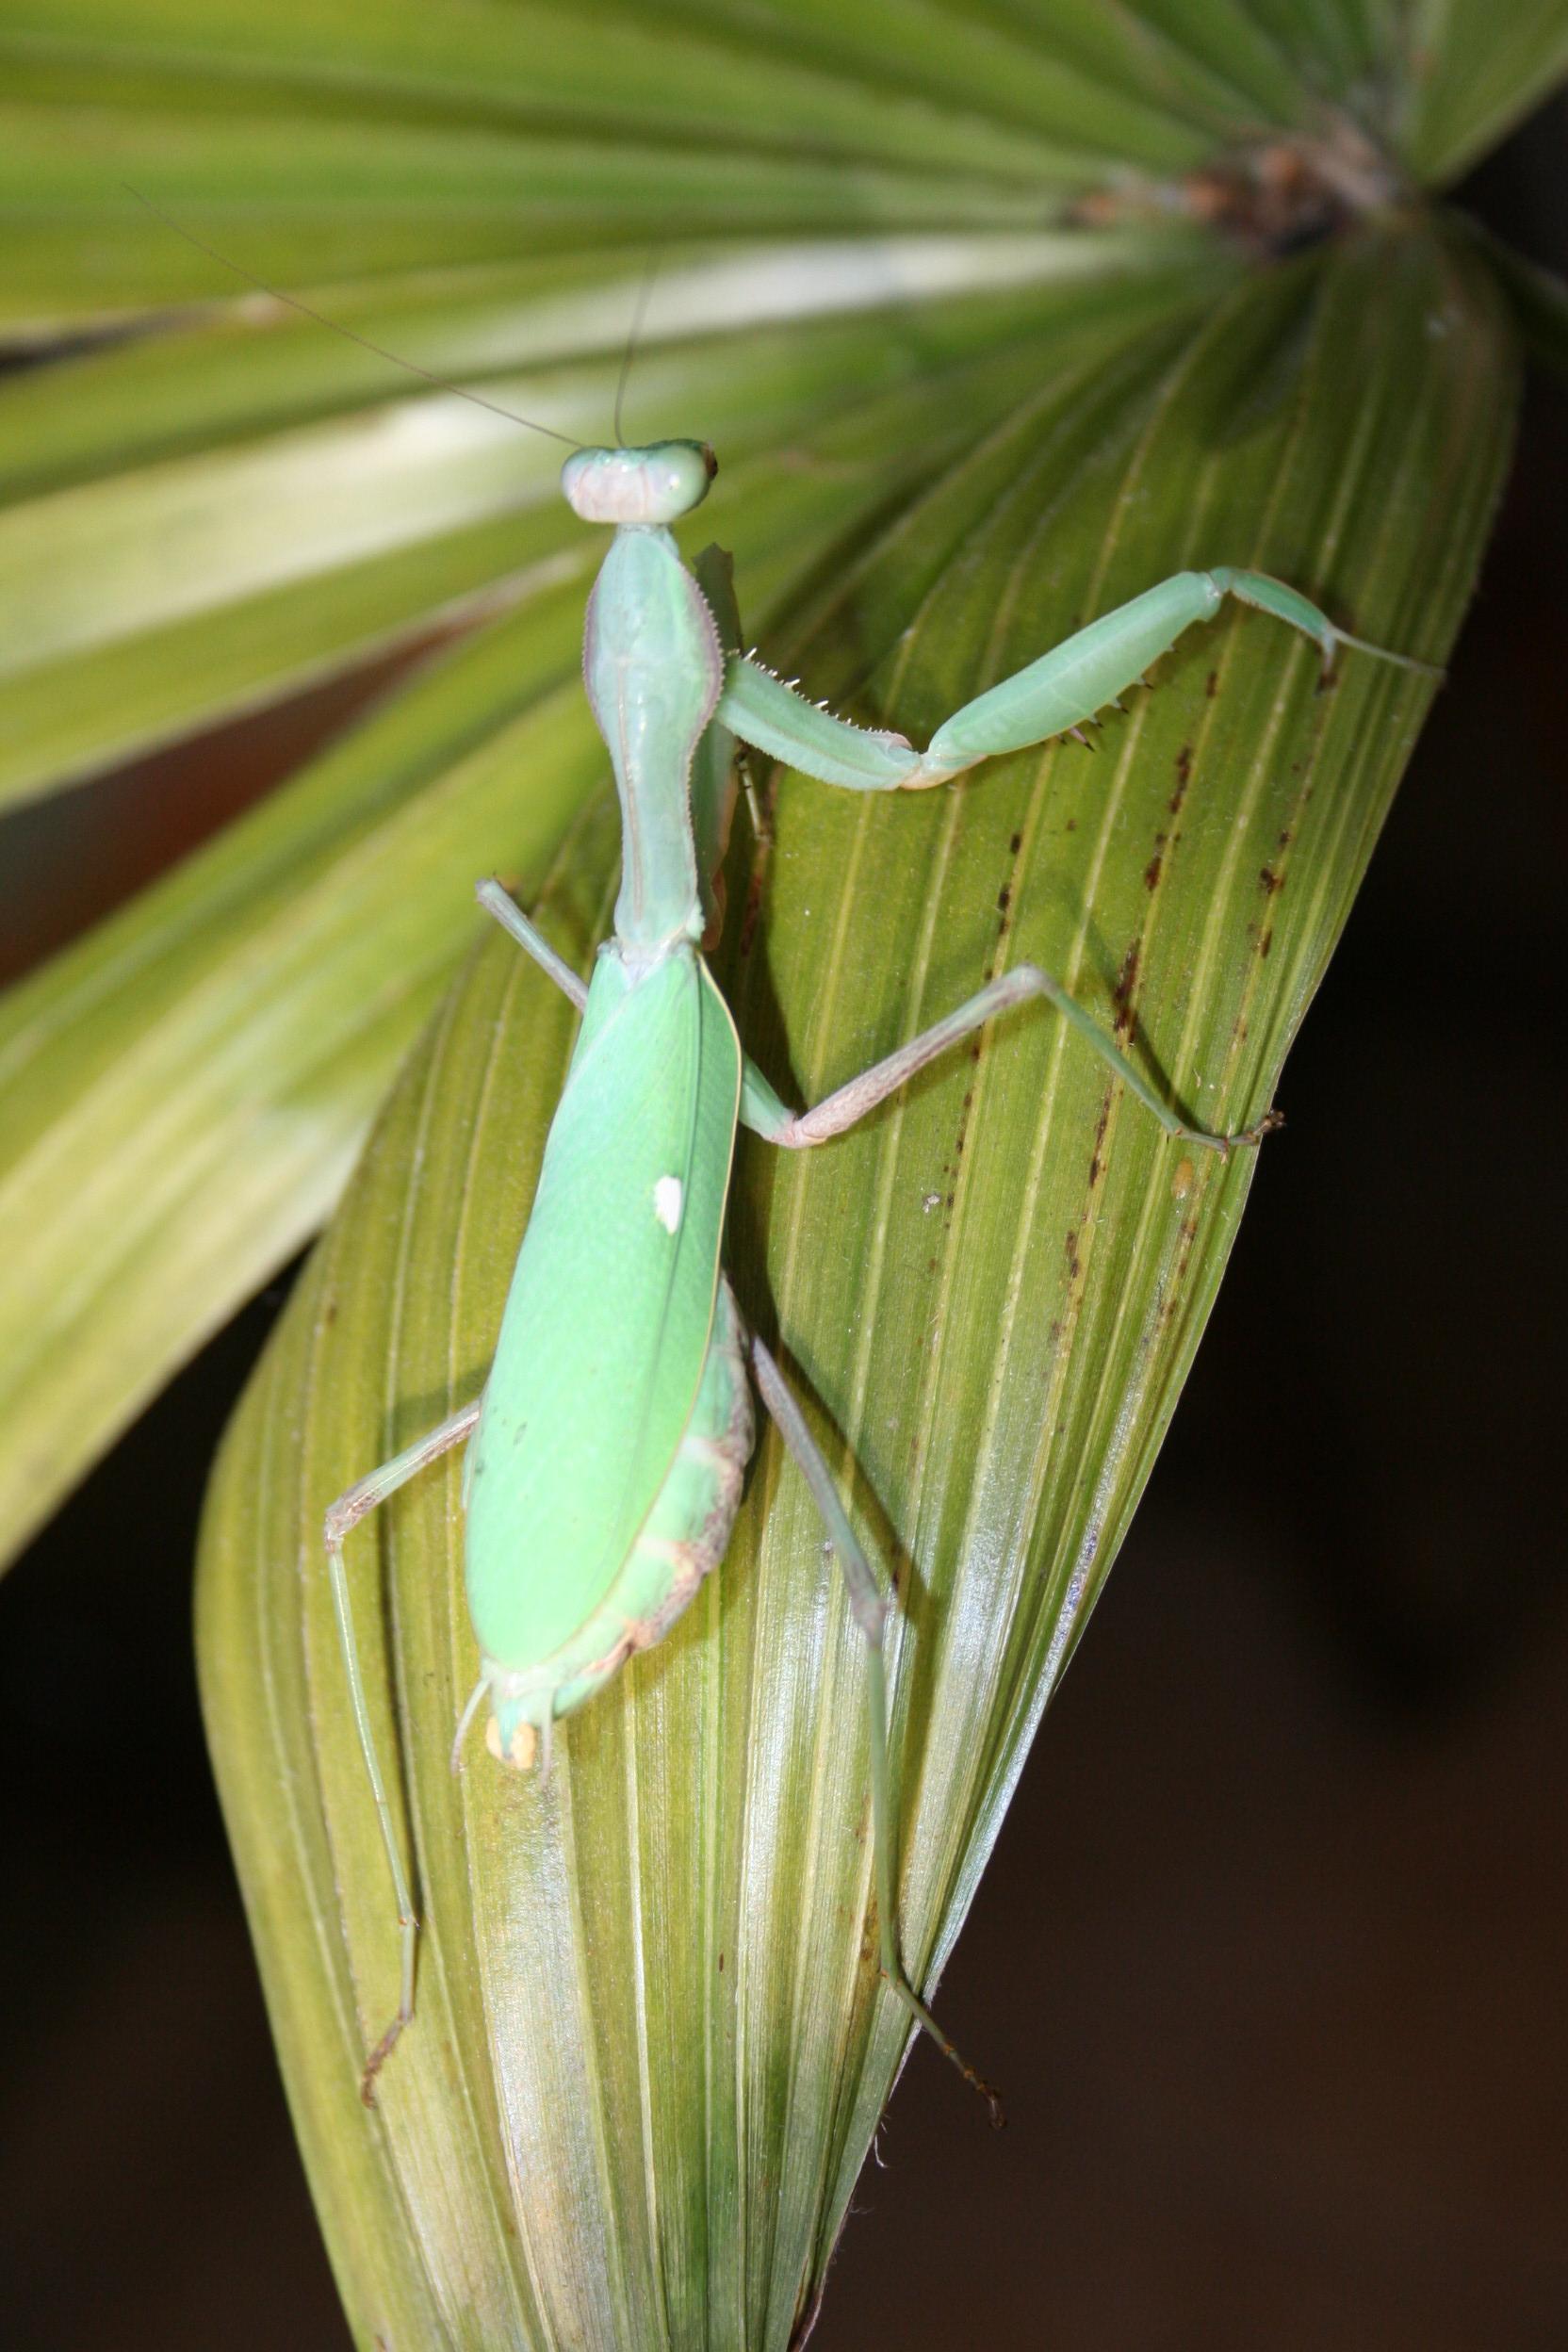 IGM 216, Sphodromantis viridis